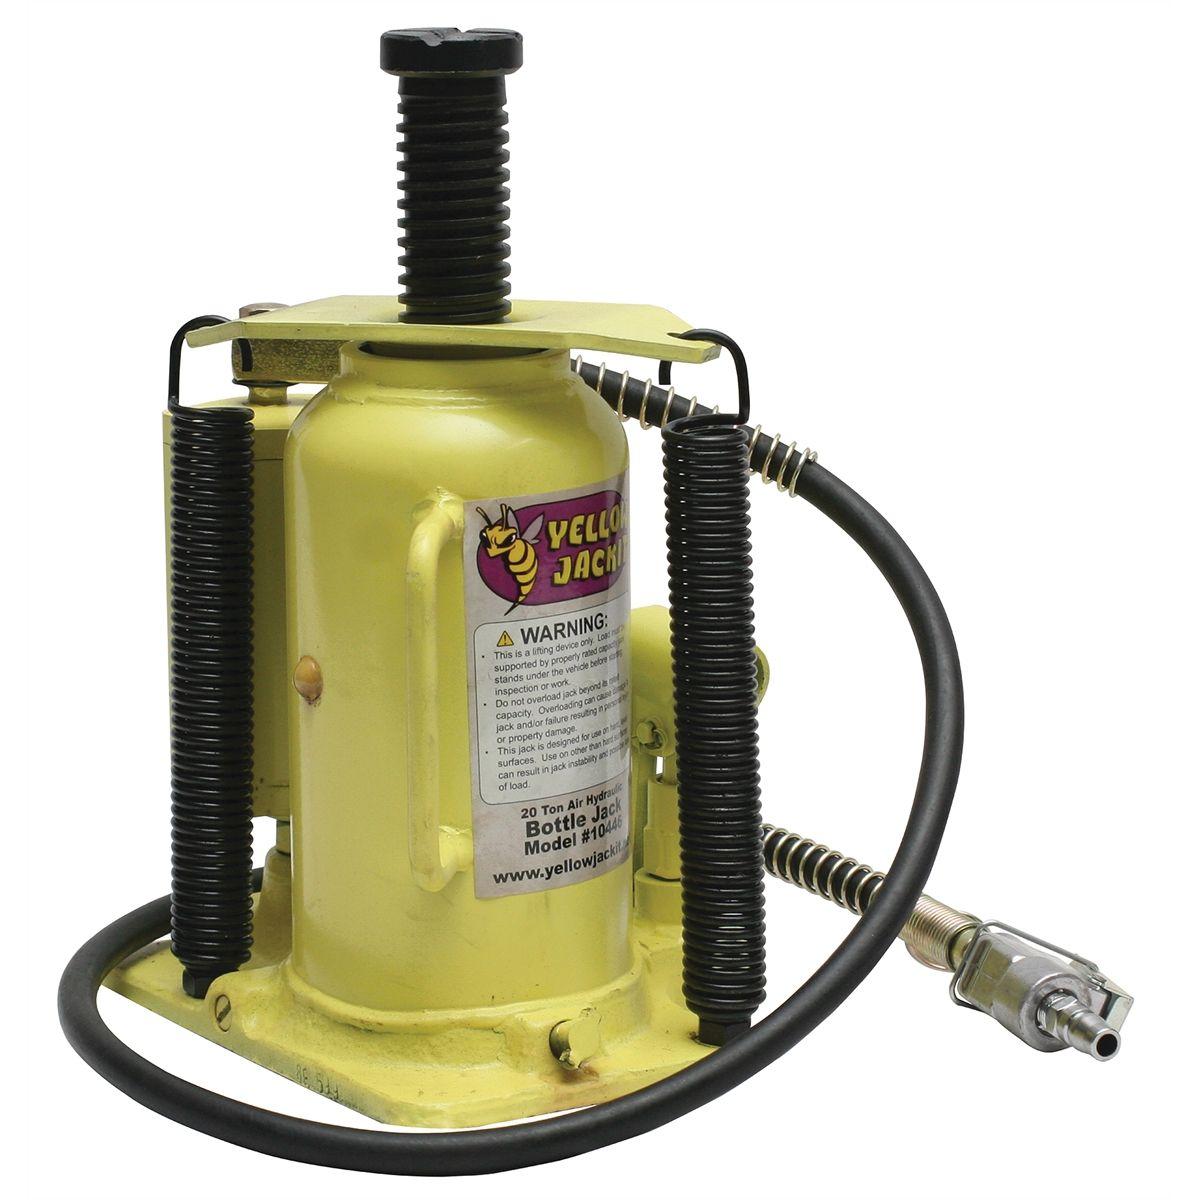 esco equipment 20 ton air hydraulic bottle jack